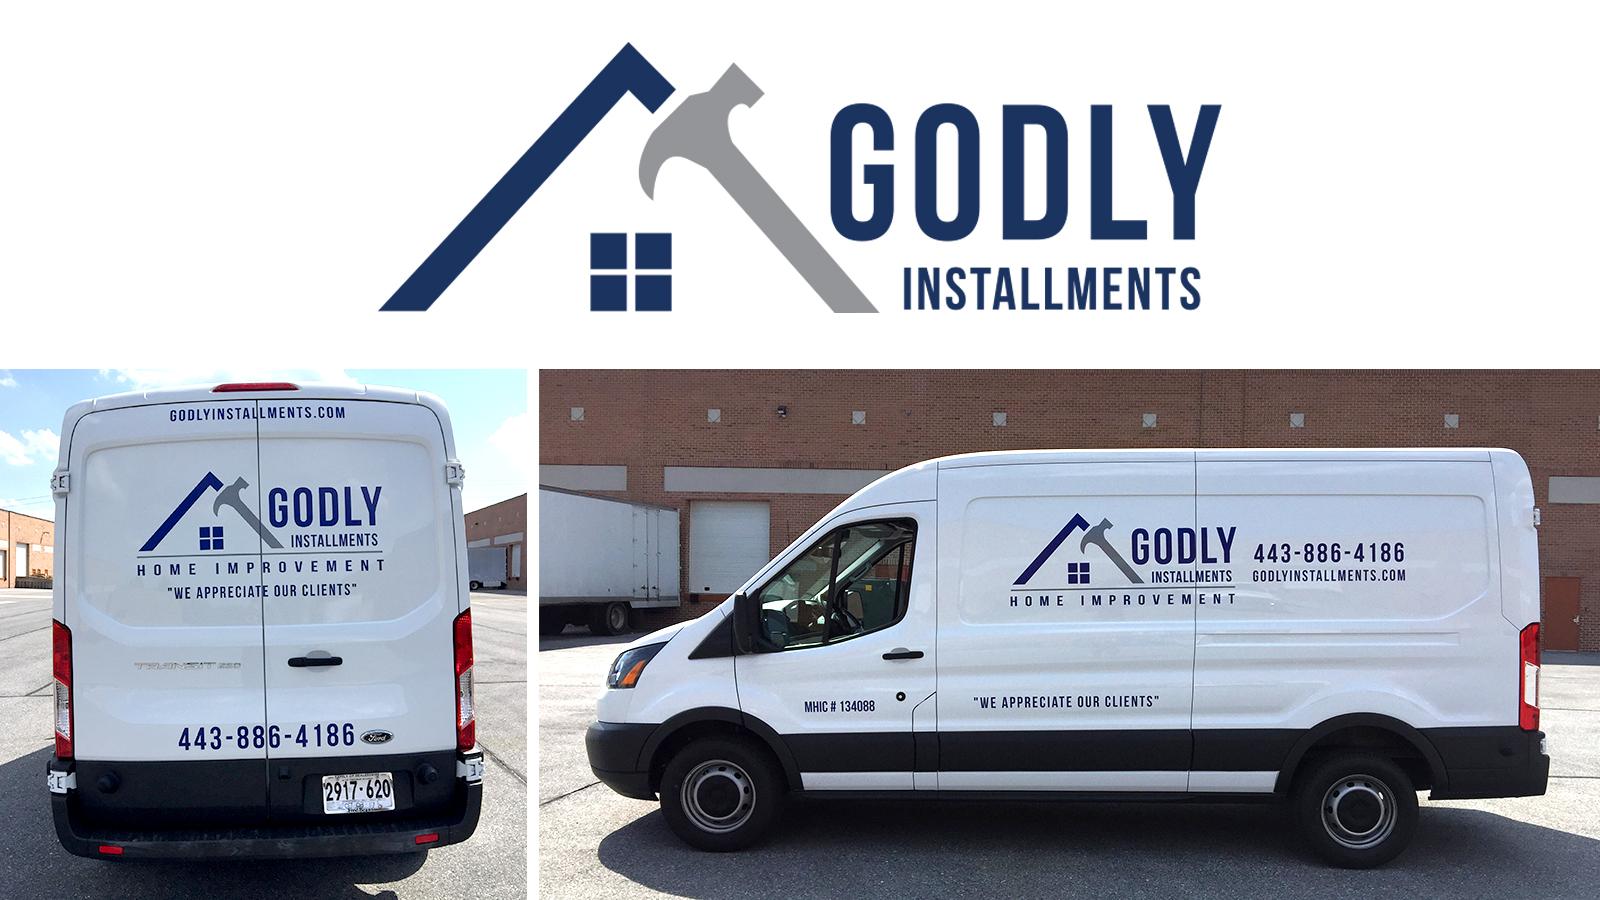 Godly Installments